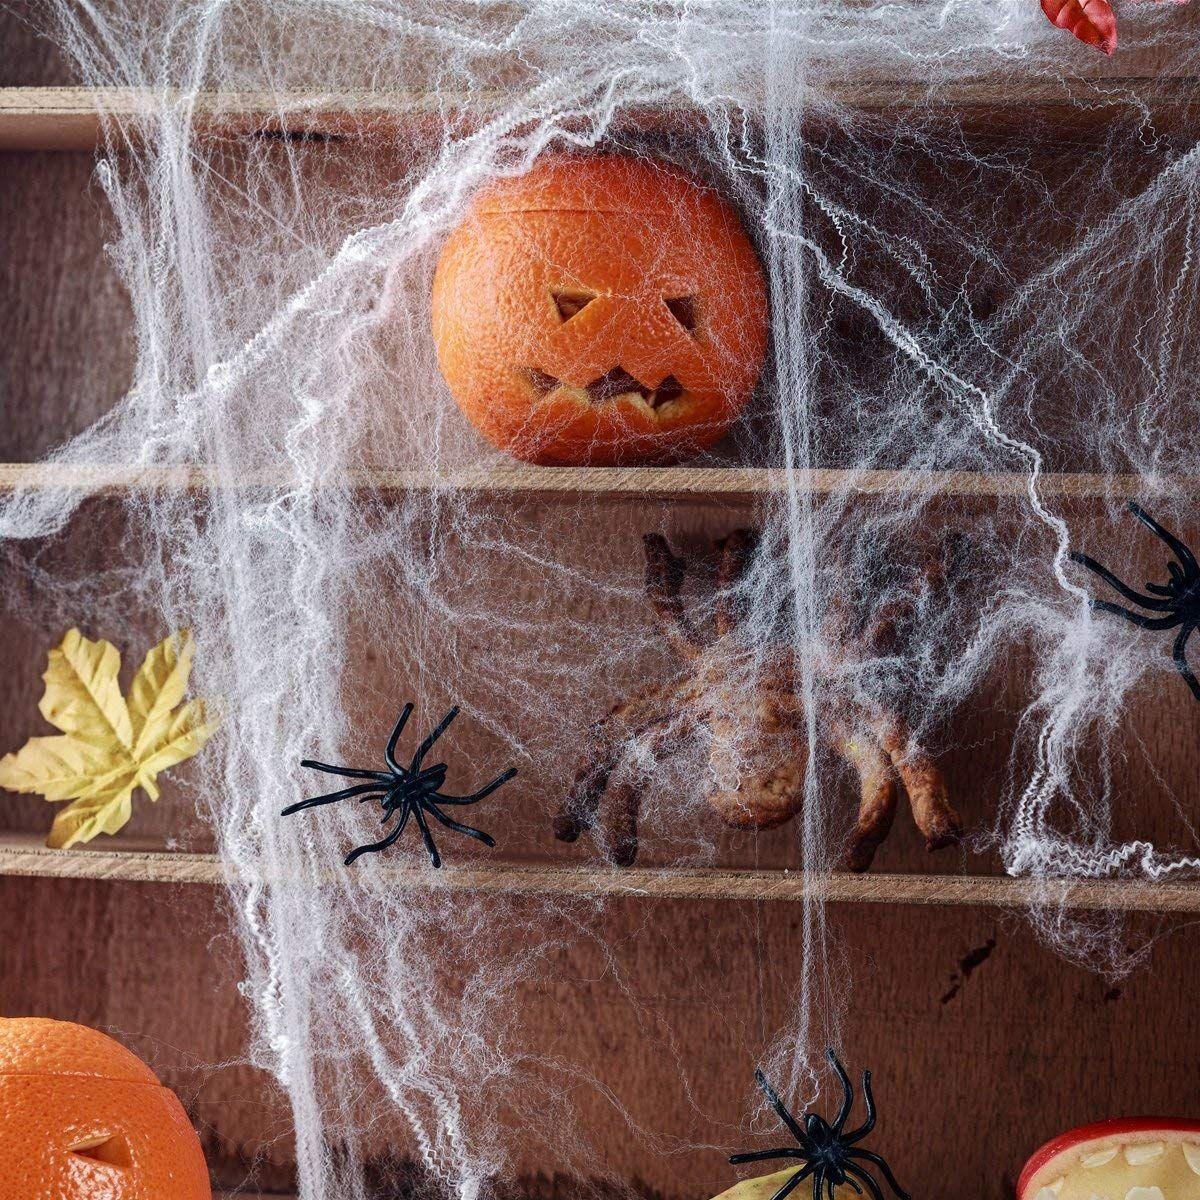 Gruselige Halloween Party Deko Perfekt Um An Halloween Das Haus Innen Oder Aussen Zu Verkleiden Der Clou Das Riesige Spinnennetz Leu Halloween Hallo